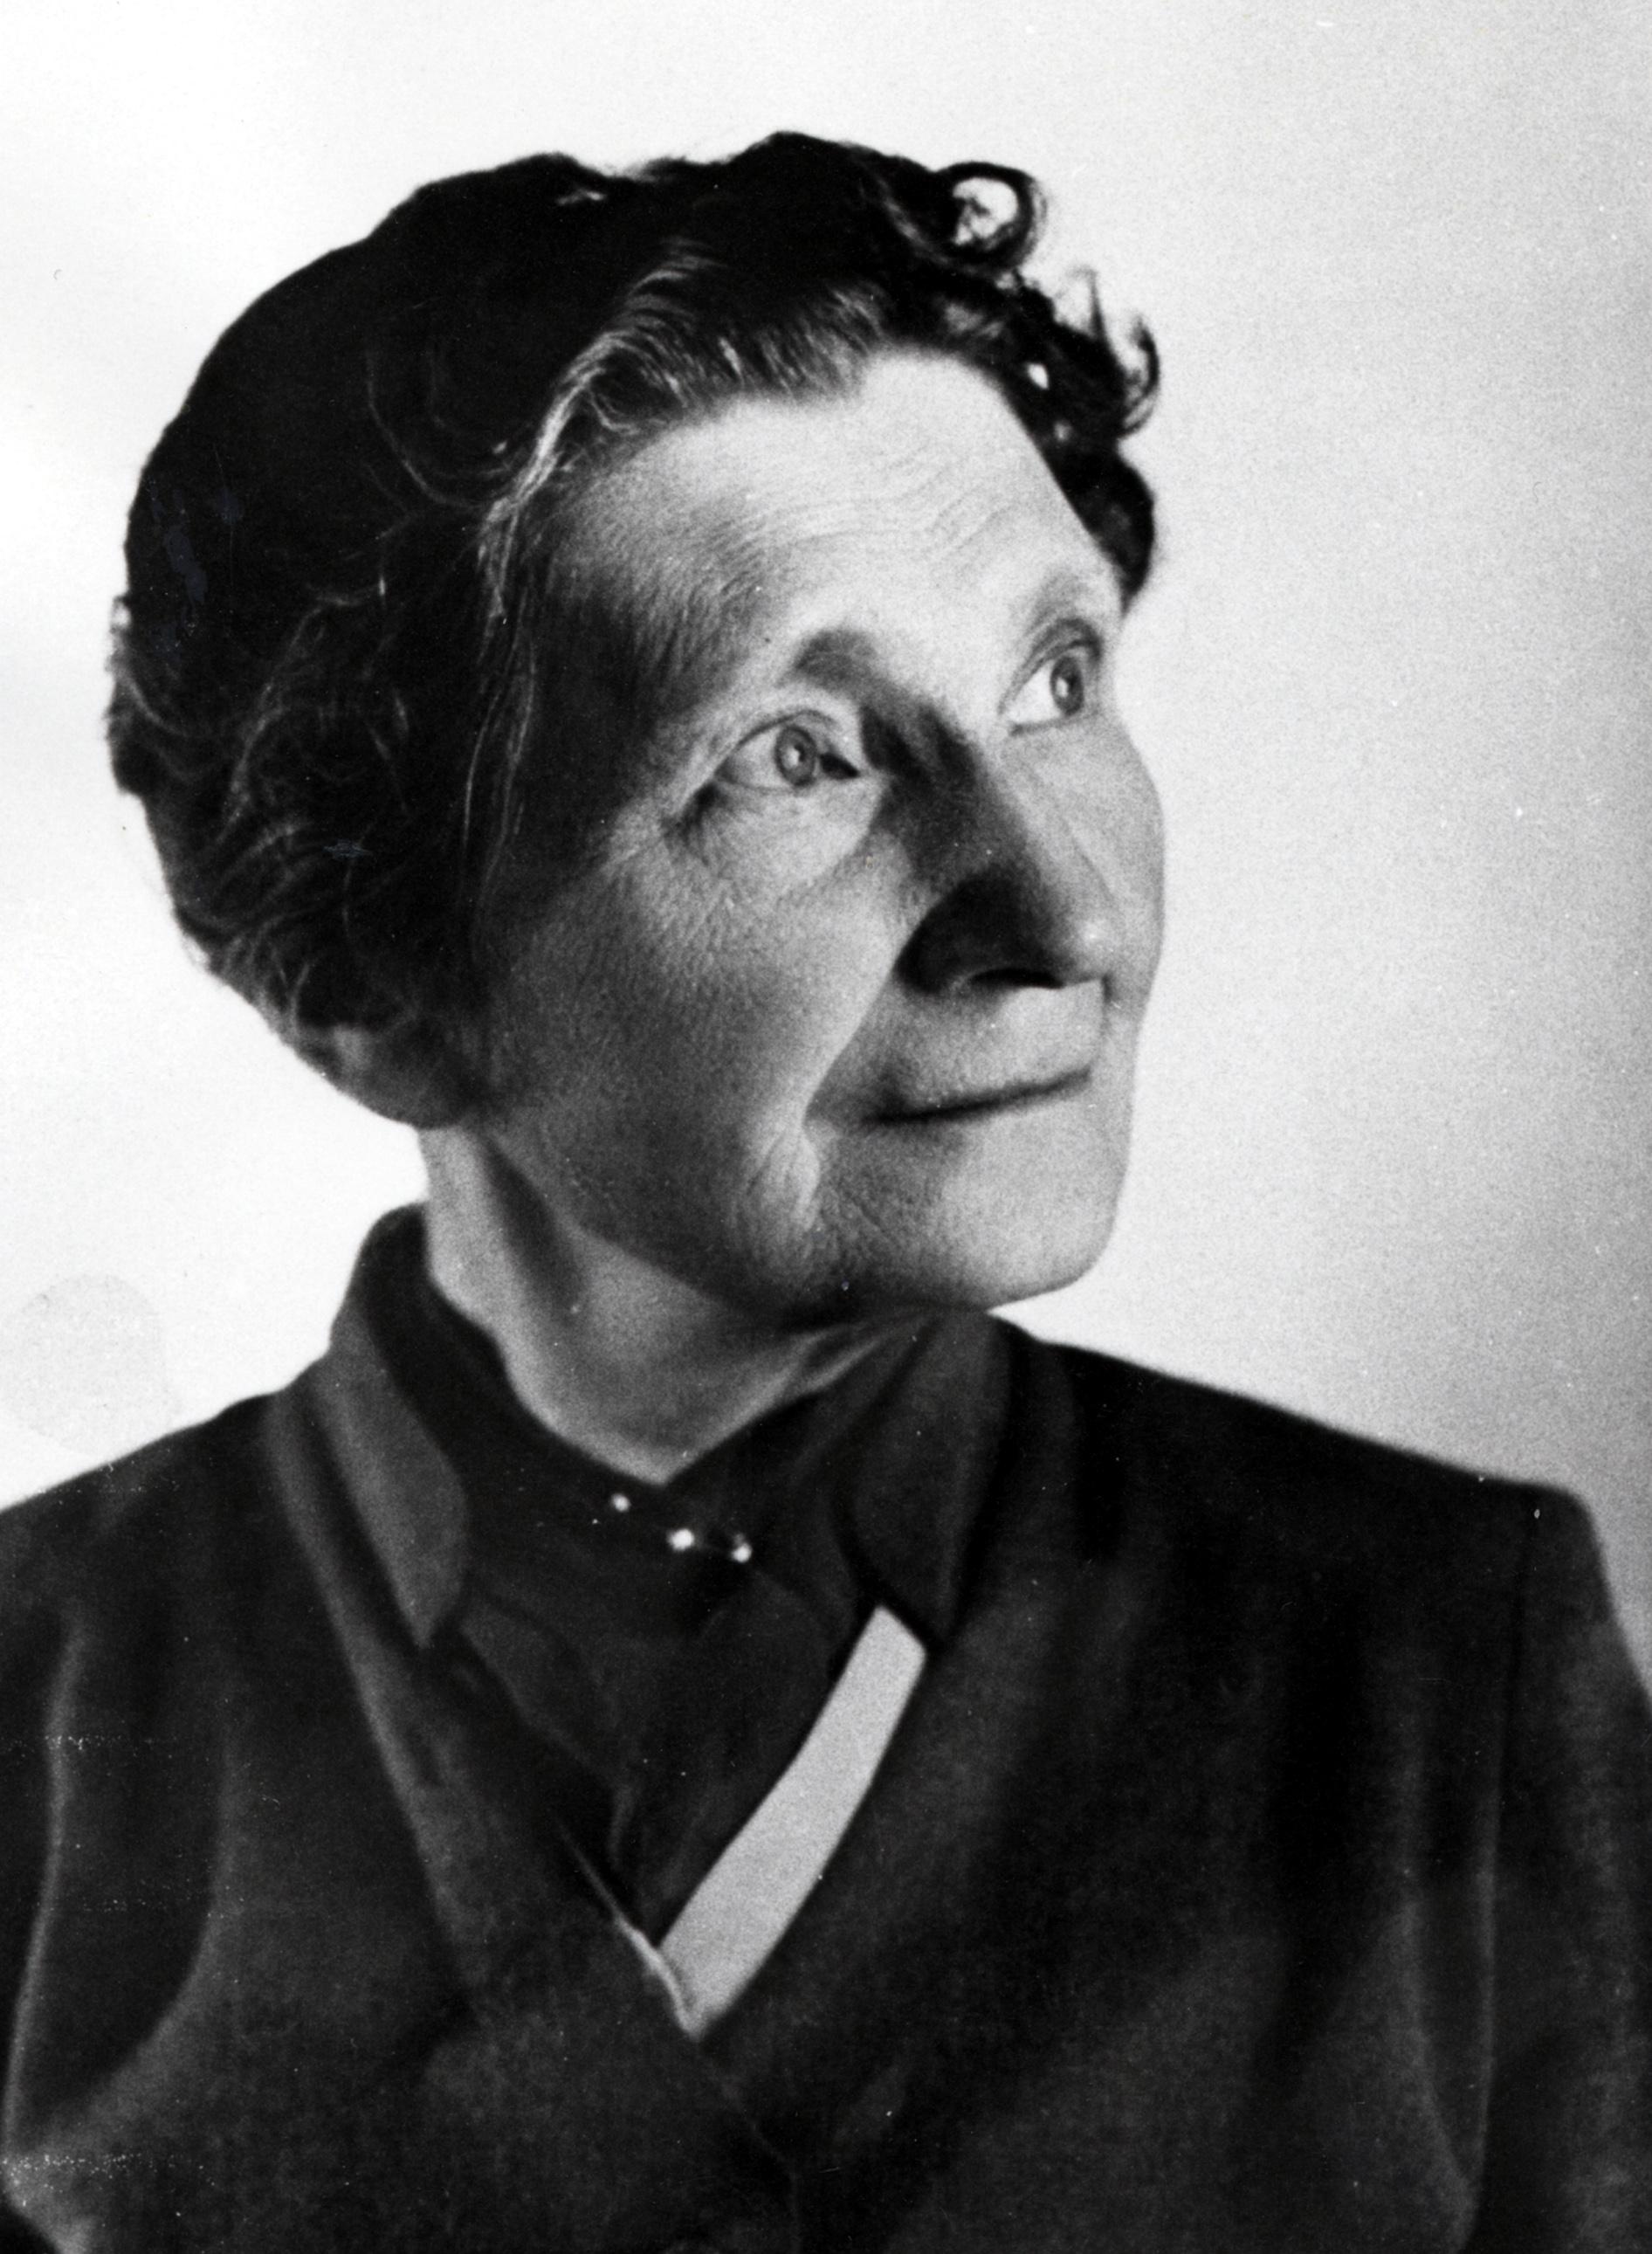 Emilia Fogelklou. Photographer and year unknown (KvinnSam, Gothenburg University Library, A 123:11)